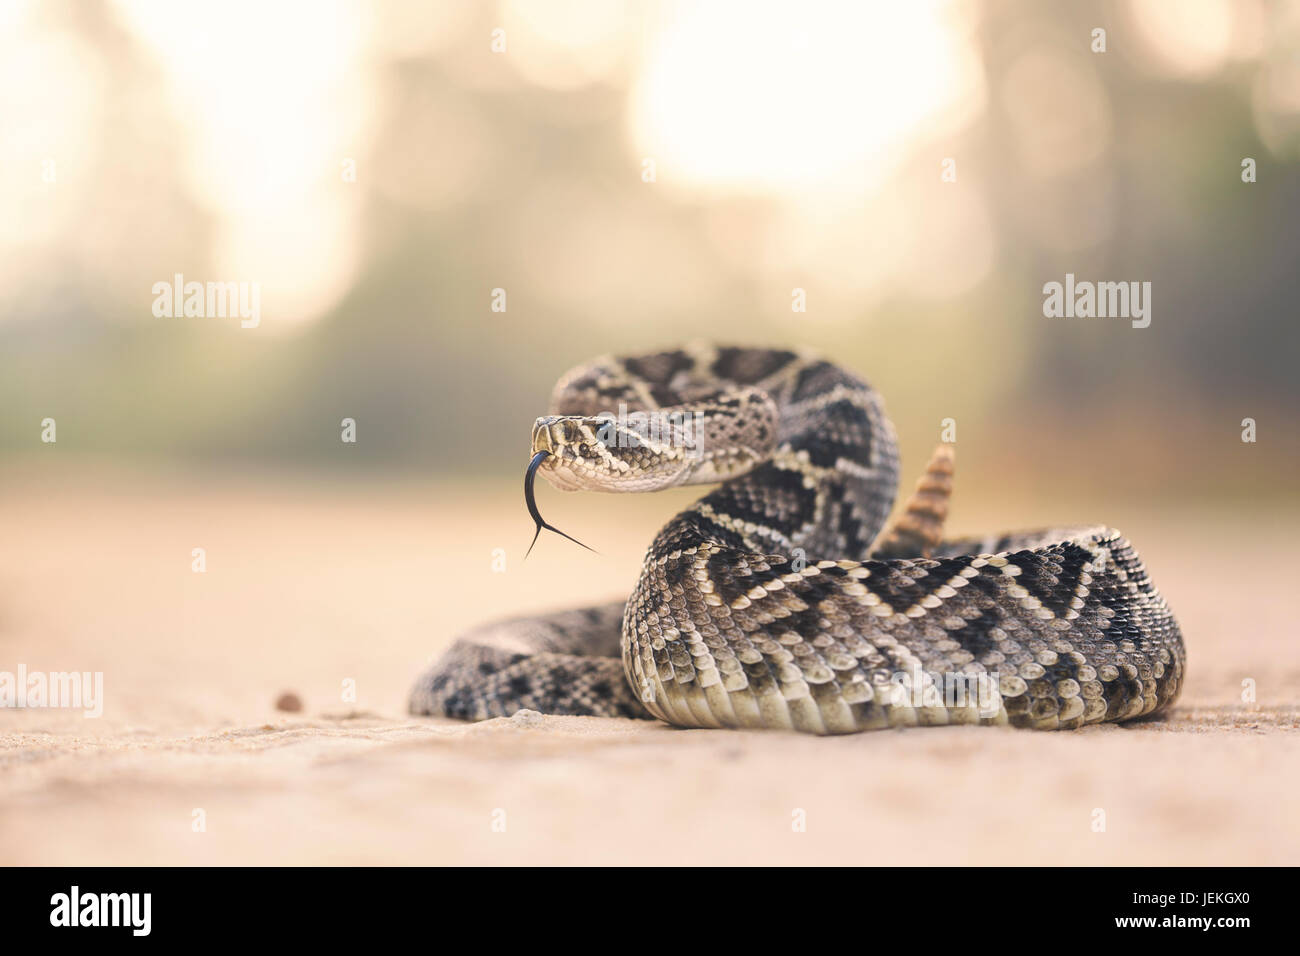 Eastern Diamondback Rattlesnake (Crotalus adamanteus), Florida, United States Stock Photo